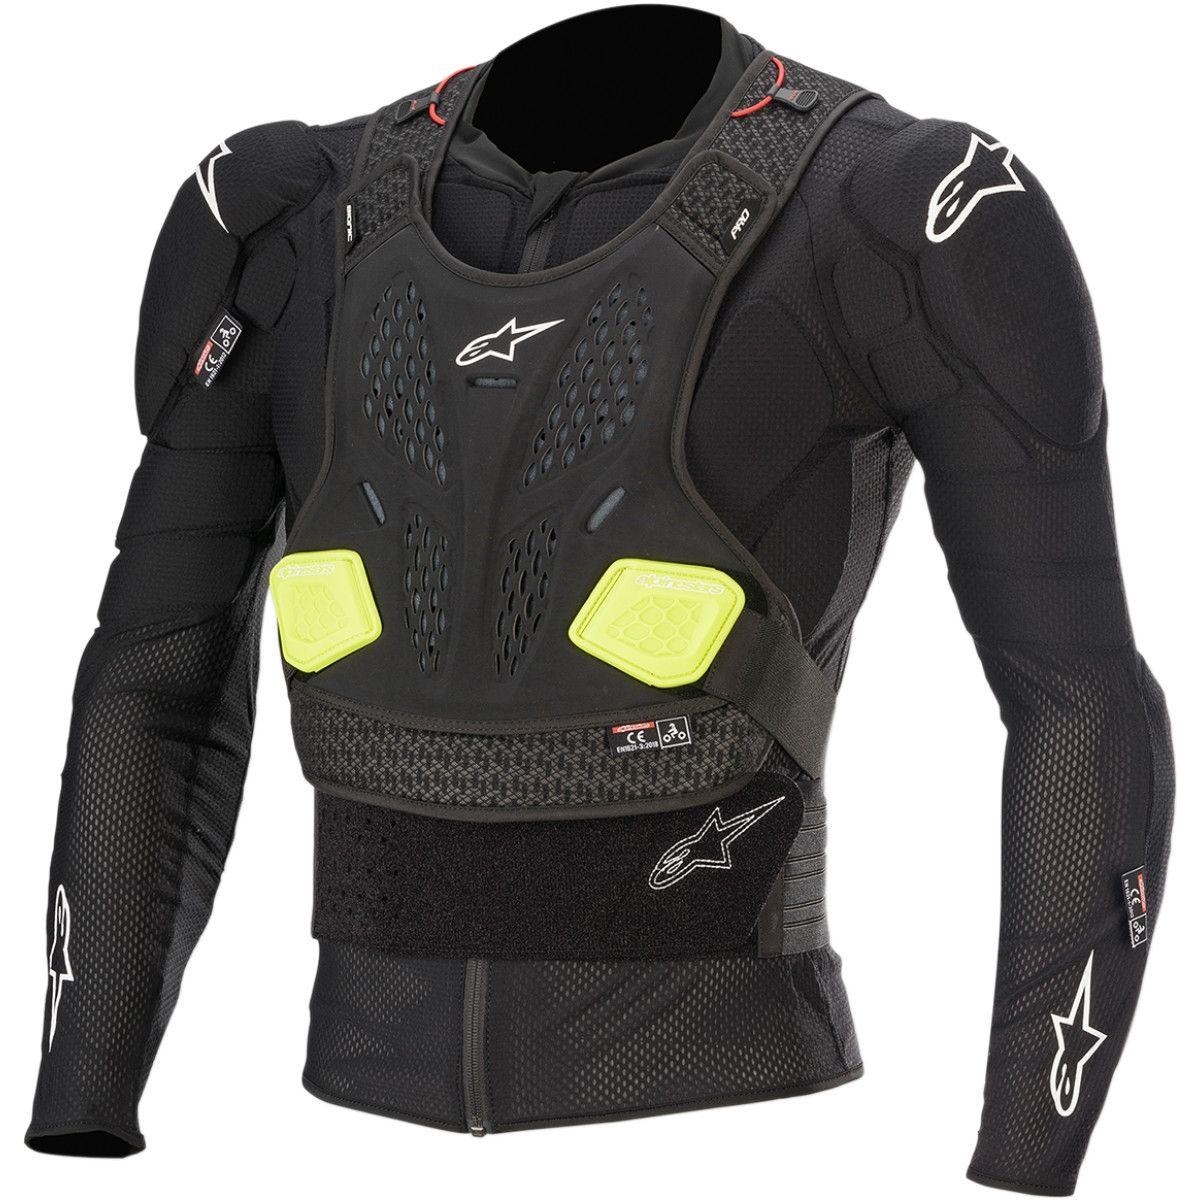 Alpinestars Bionic Pro V2 Protectievest Black/Fluor Yellow